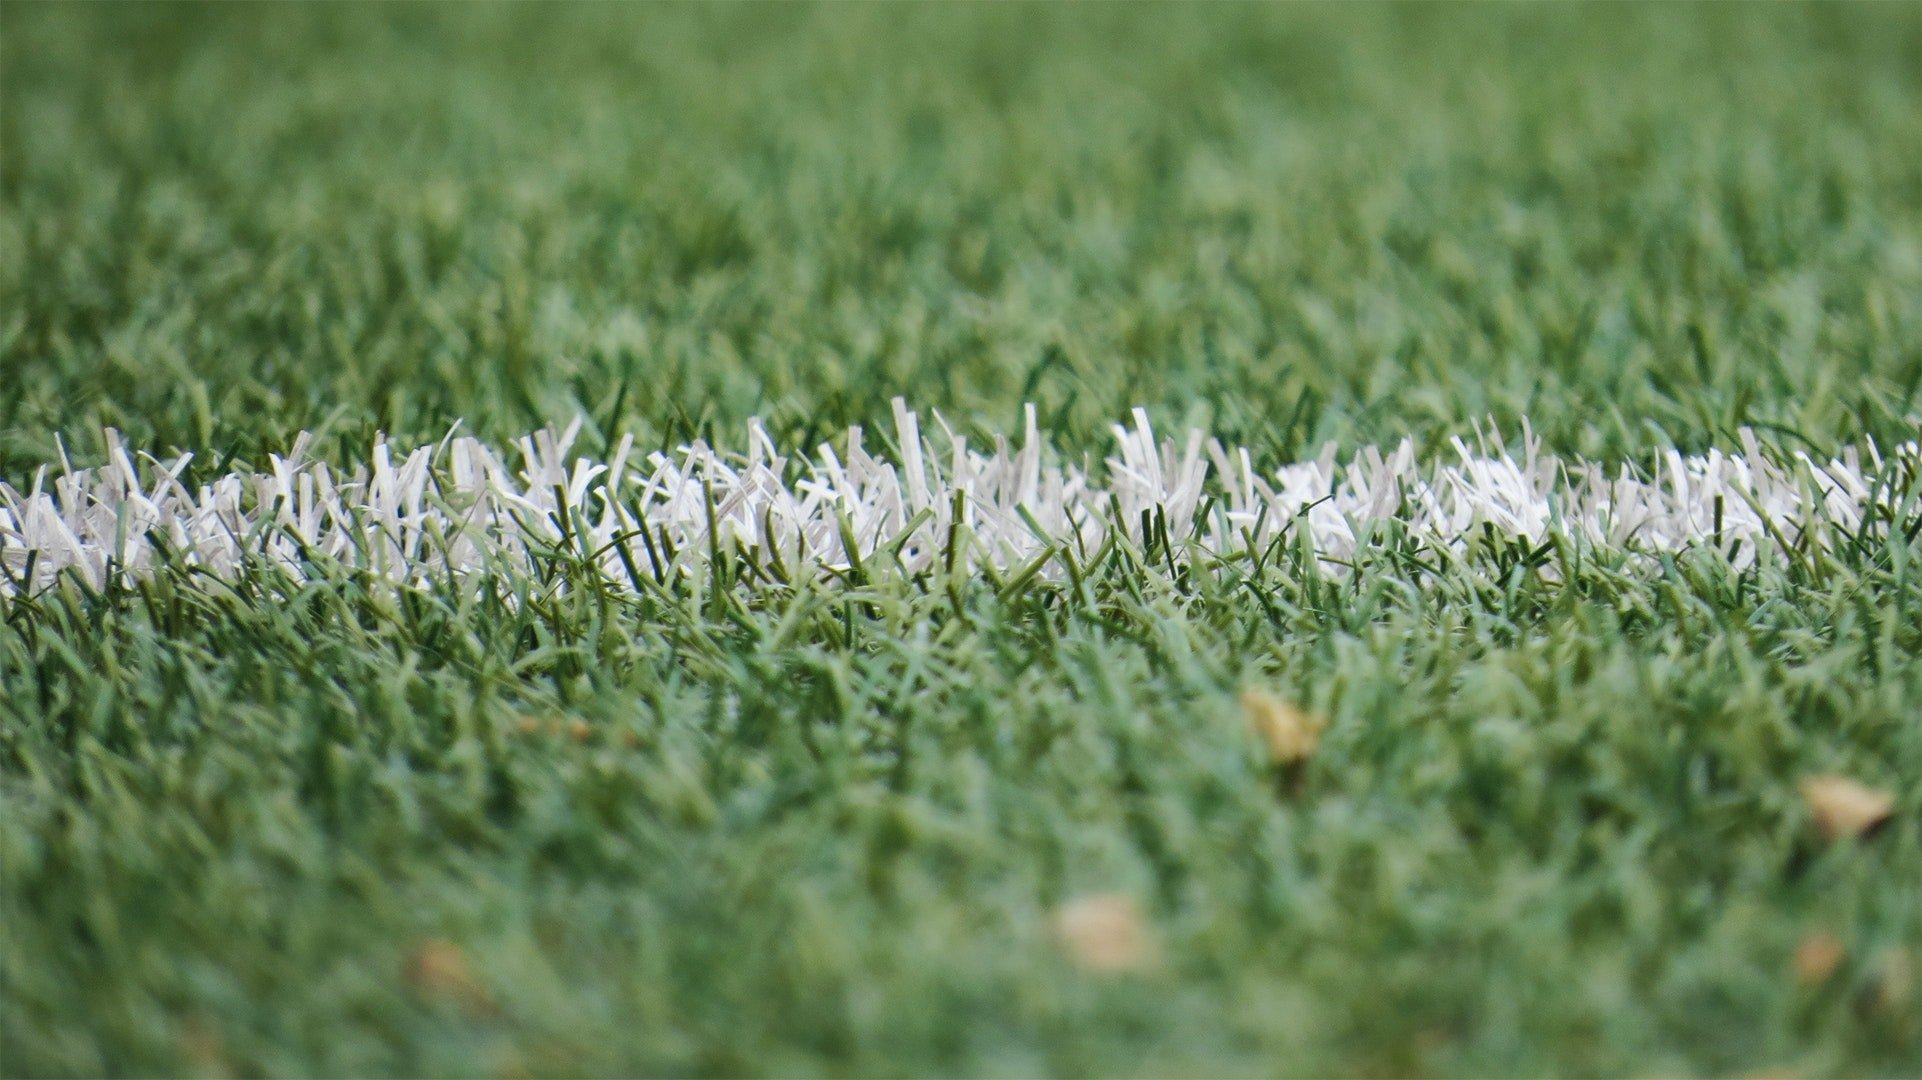 voetbalveld via pexels